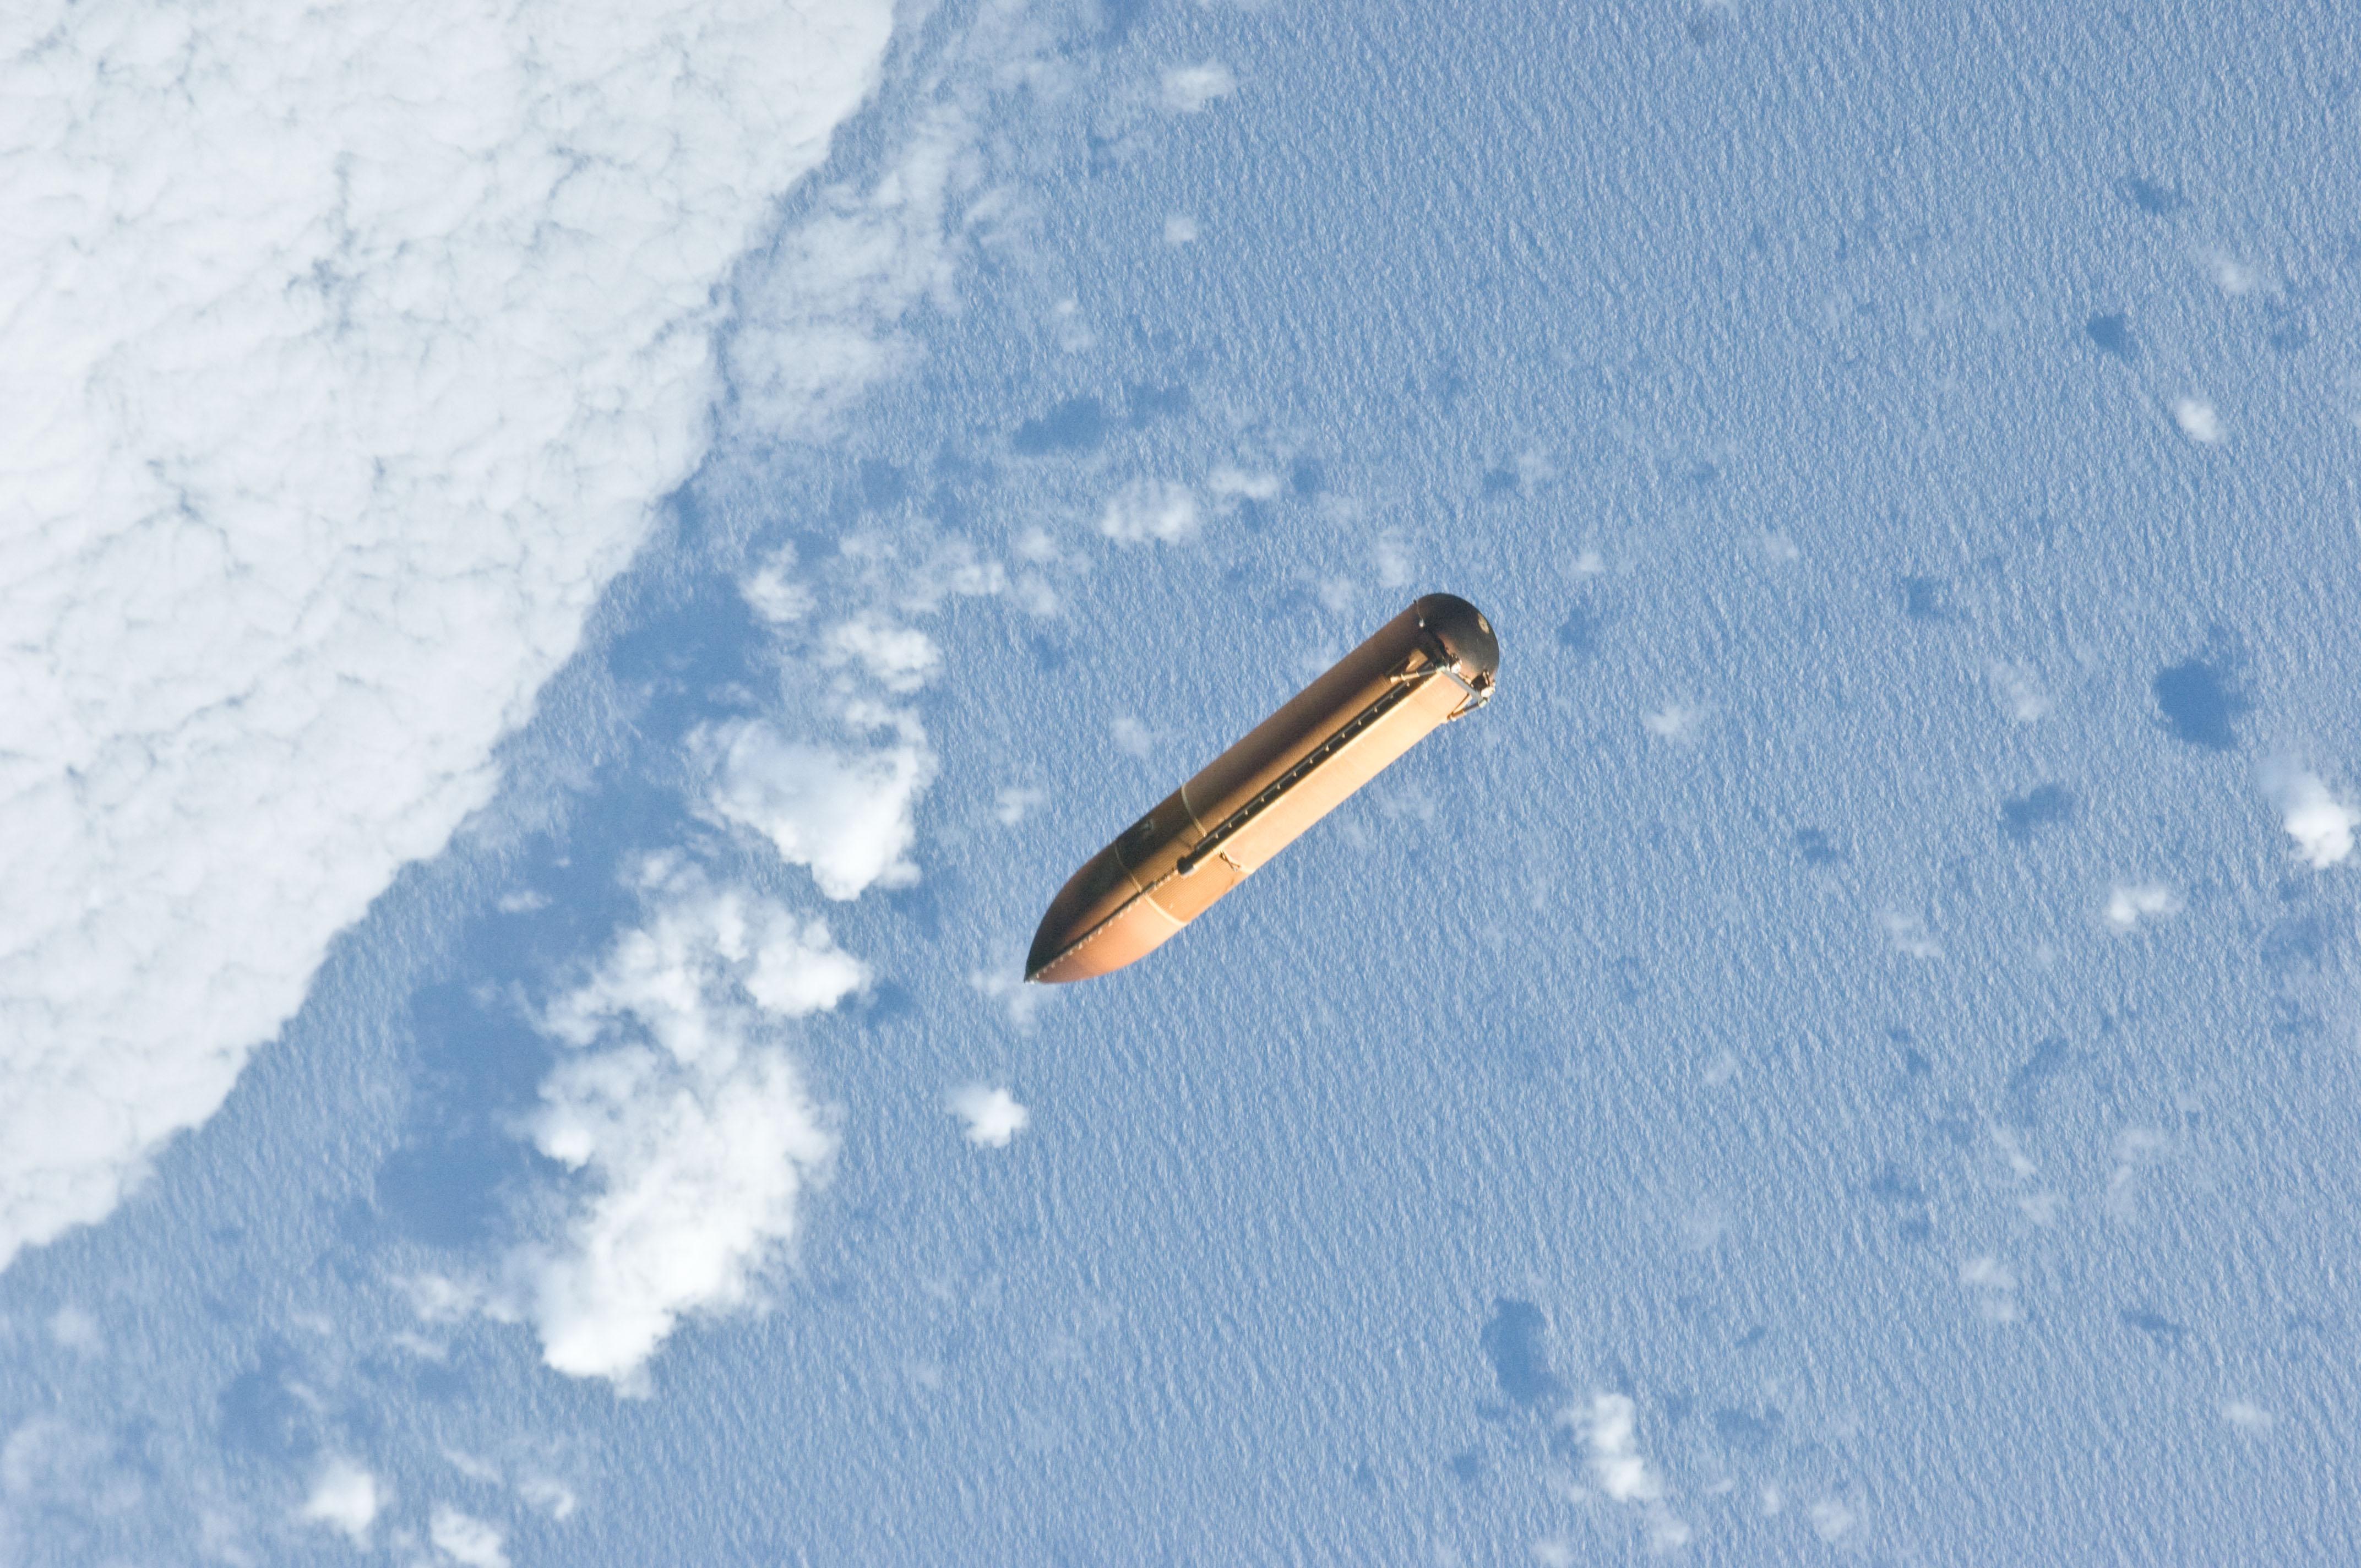 nasa space shuttle gas tank - photo #32